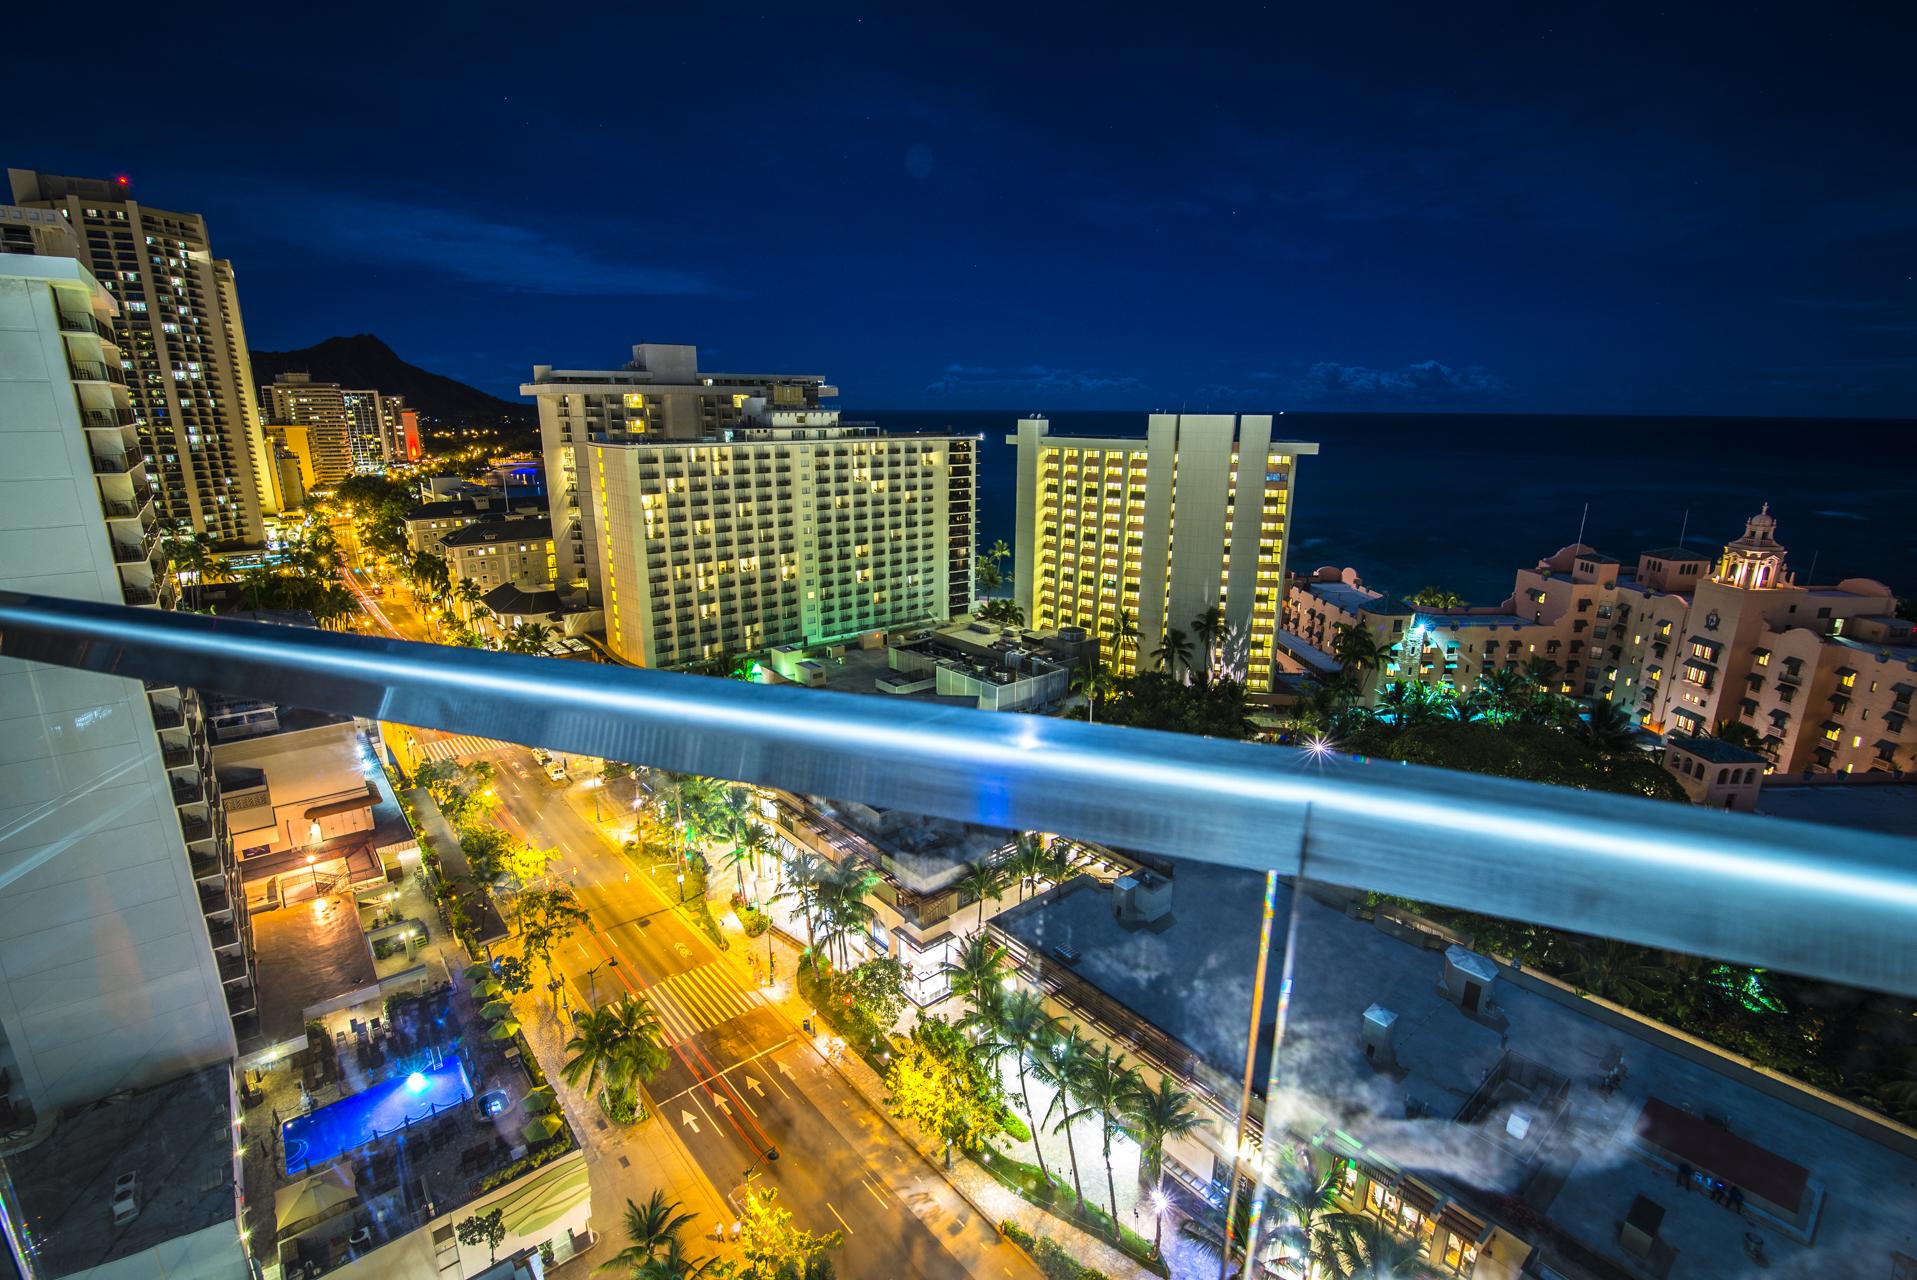 Sky Waikiki_SKY Deck at night.jpg